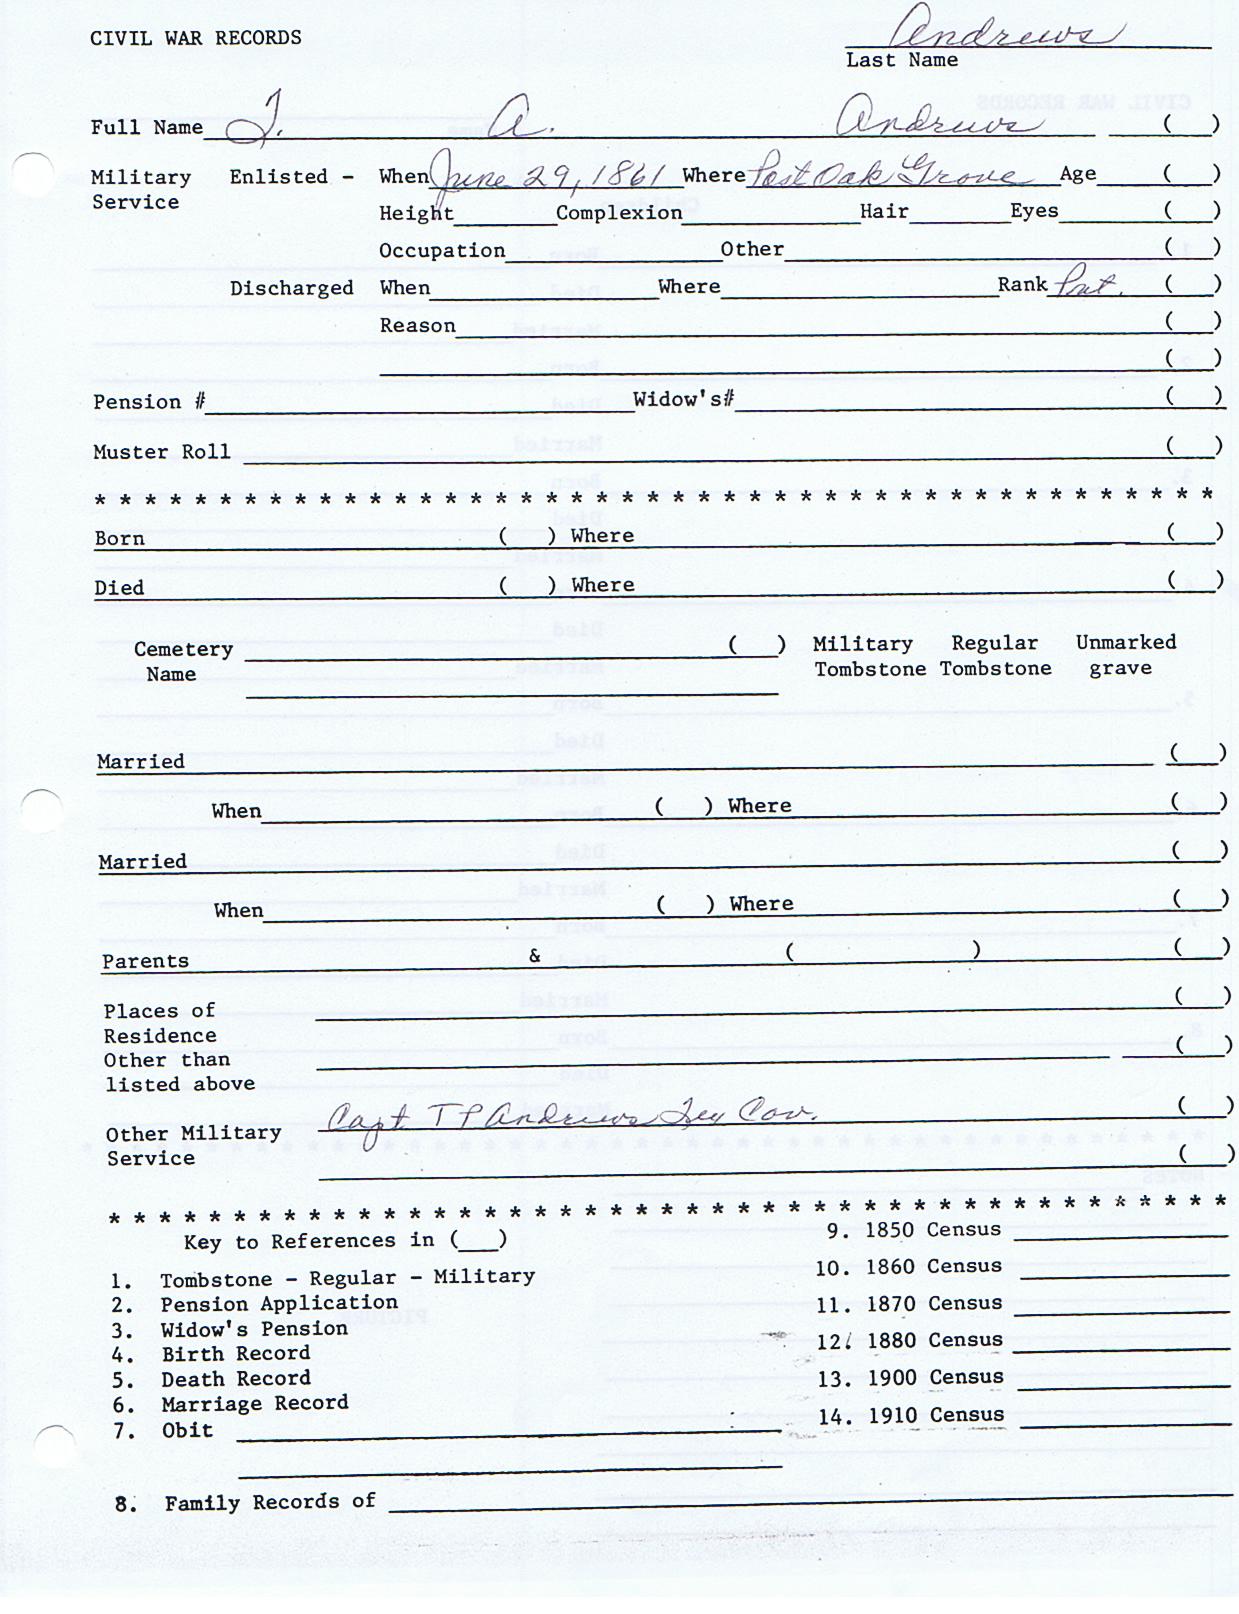 andrews-kaufman_civil_war_records-3460